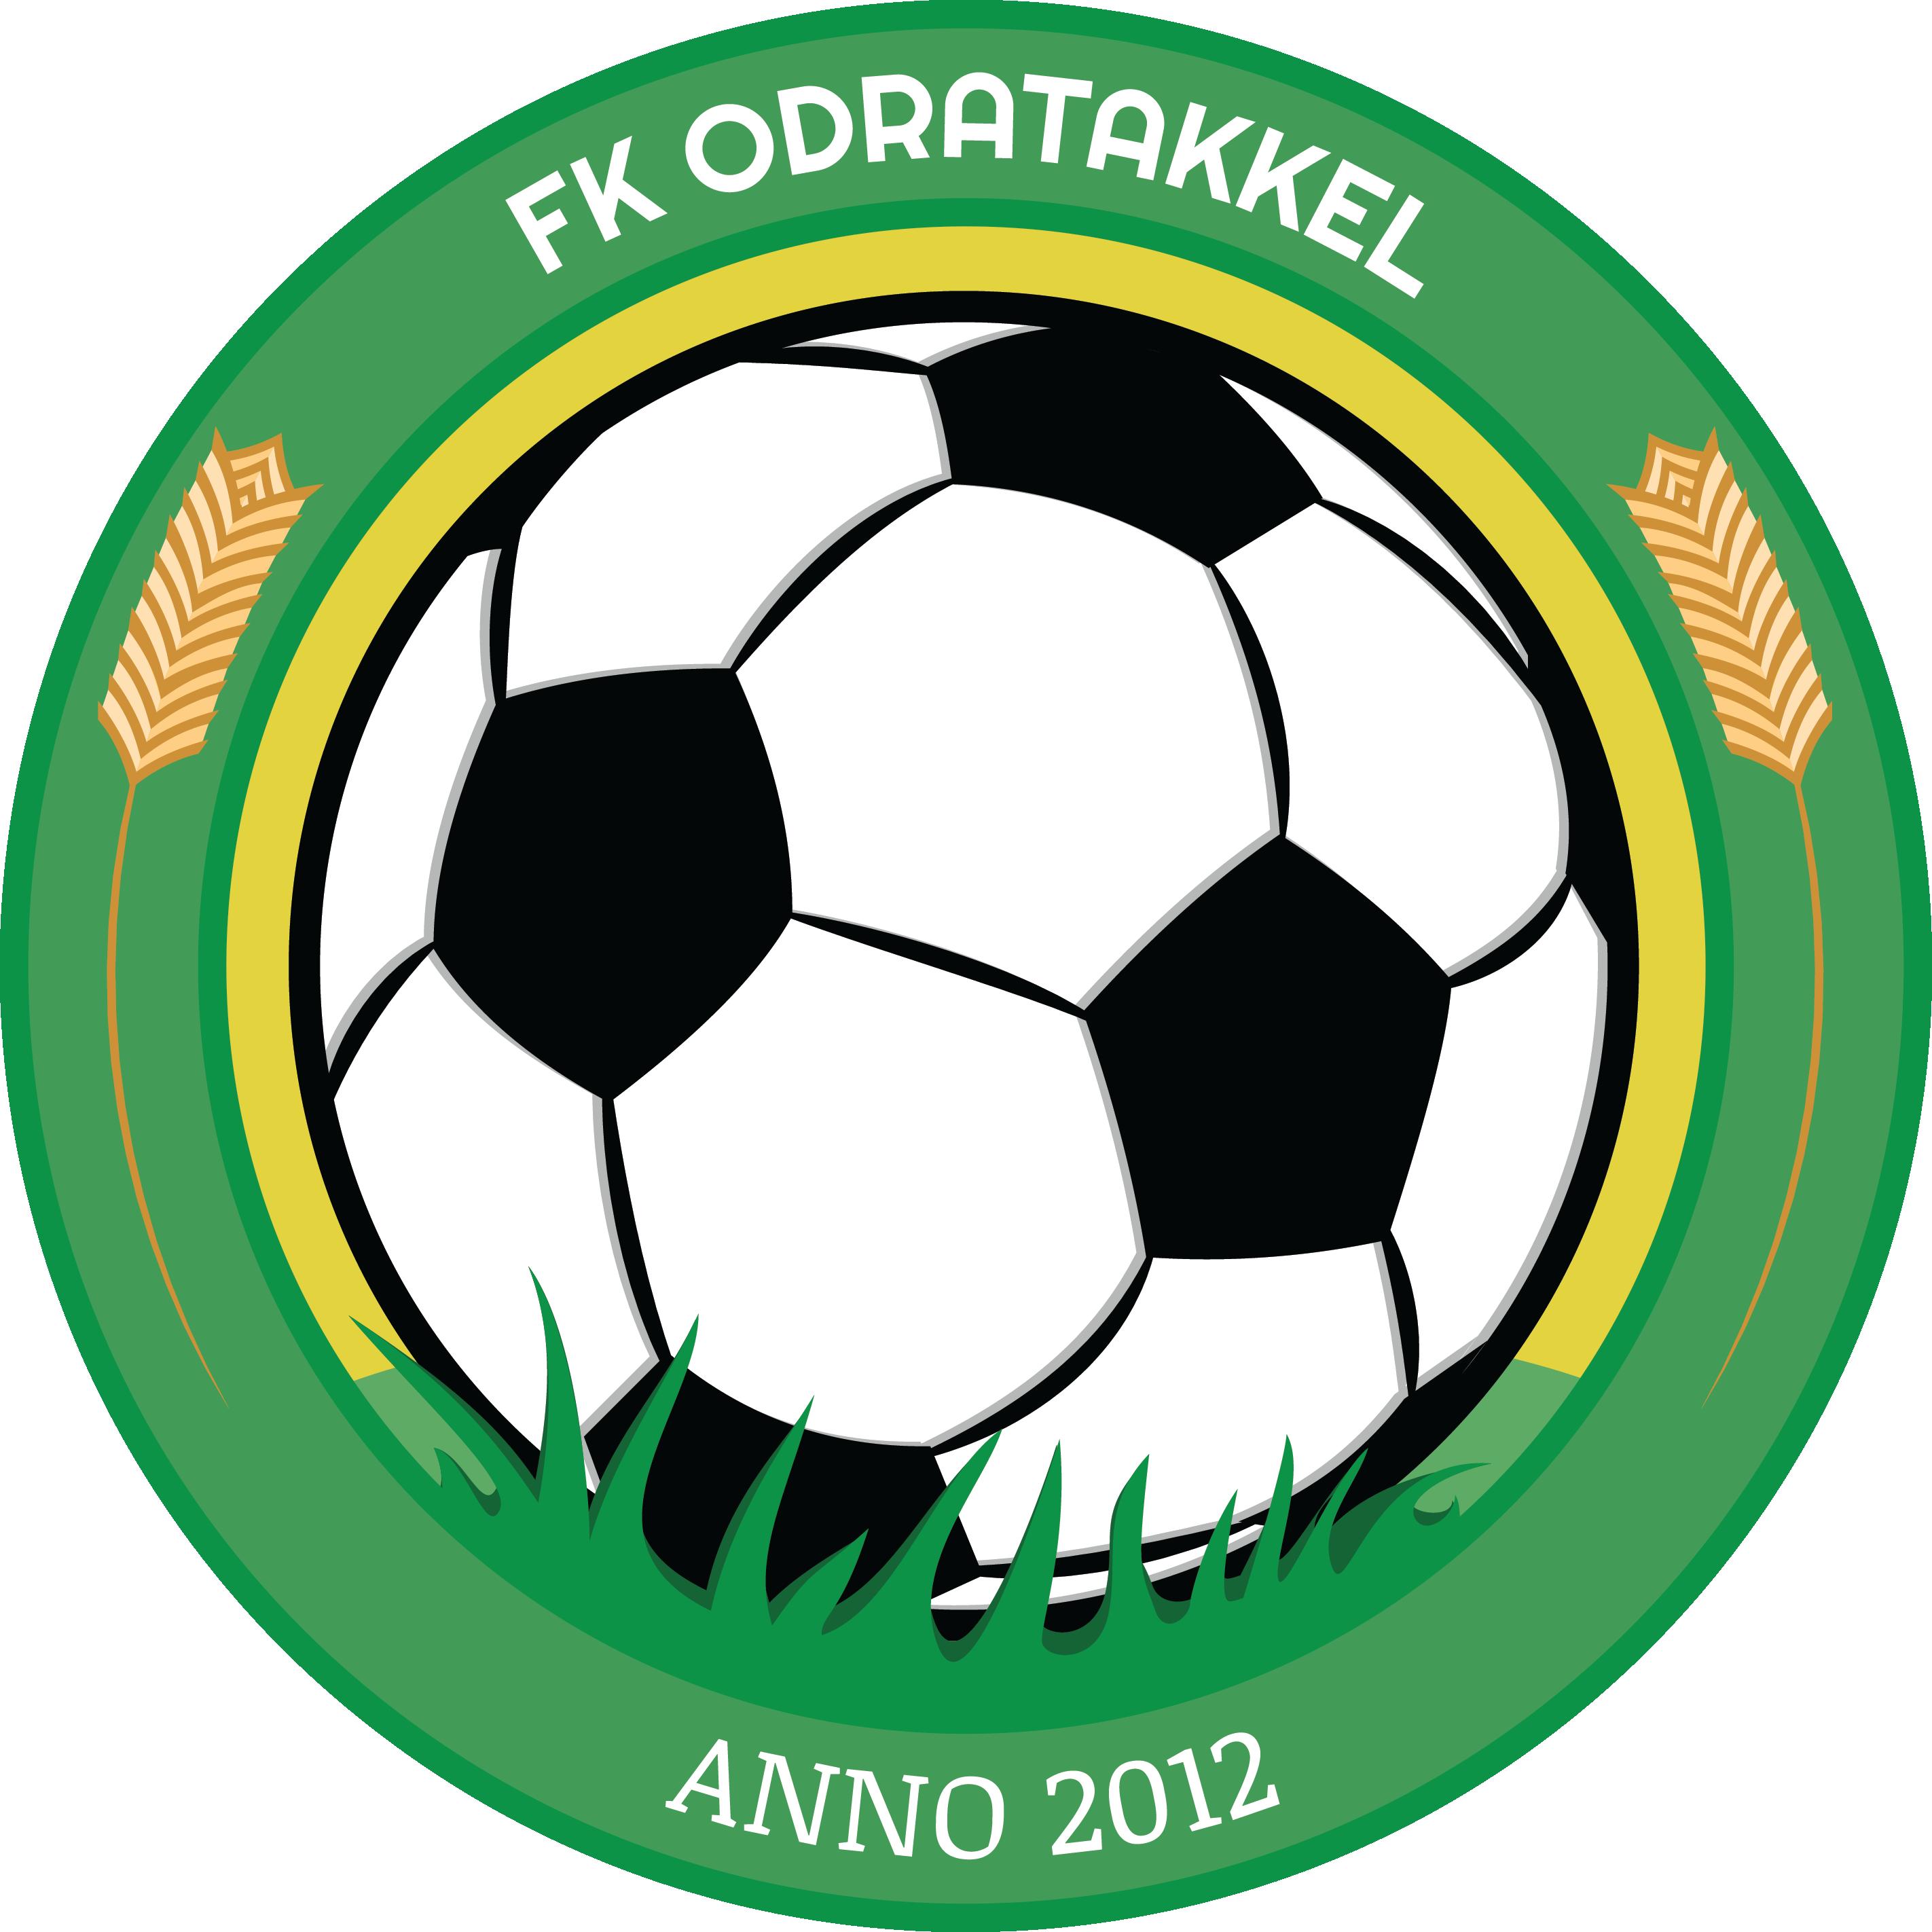 SRL. FK Odratakkel